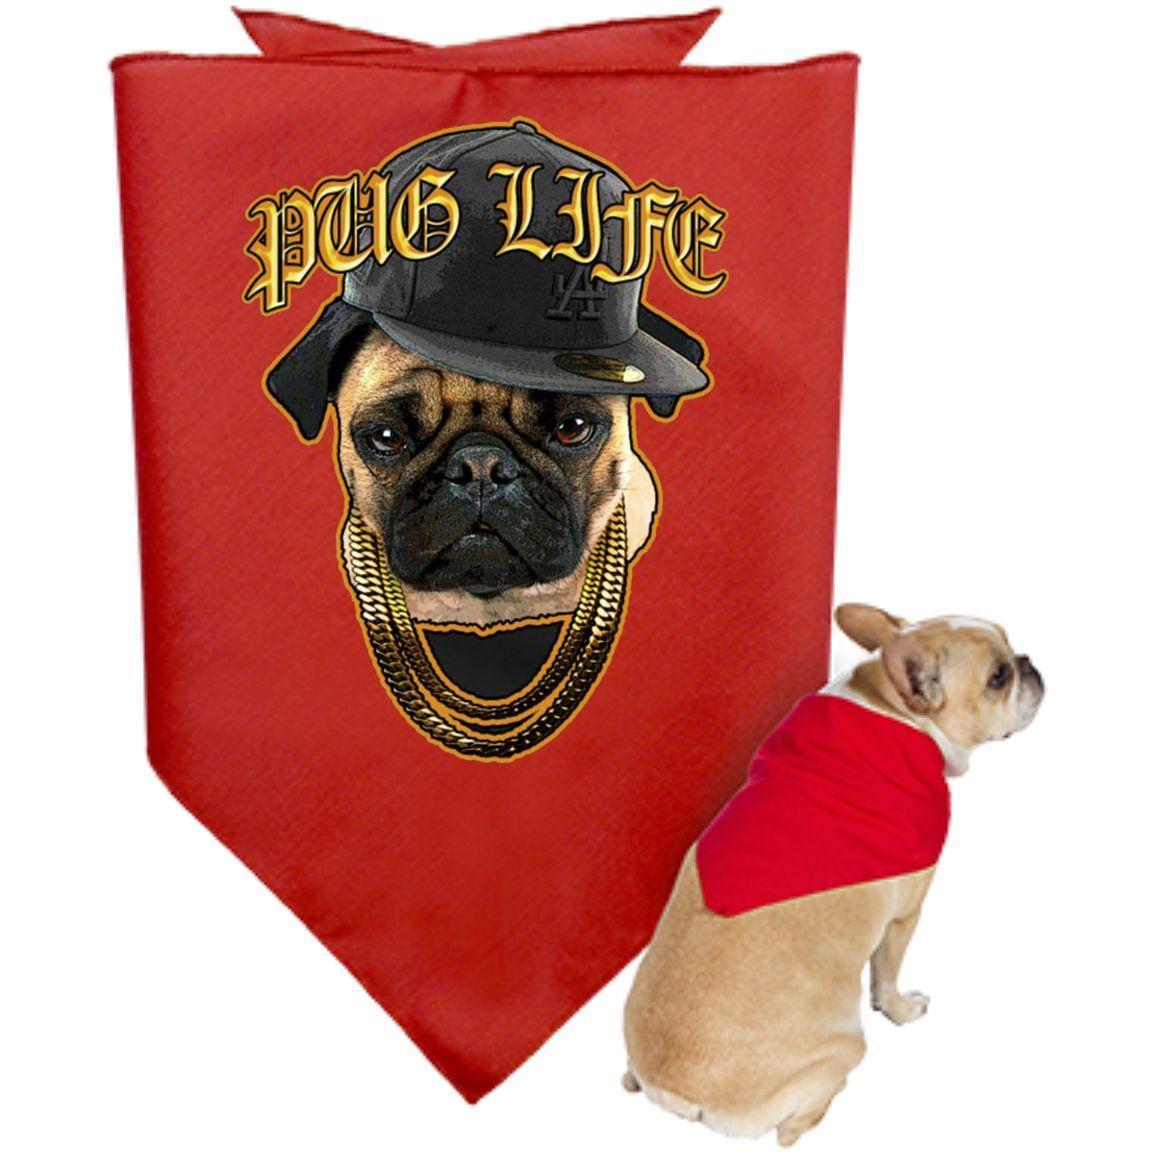 Pug Life #5 3905 Doggie Bandana